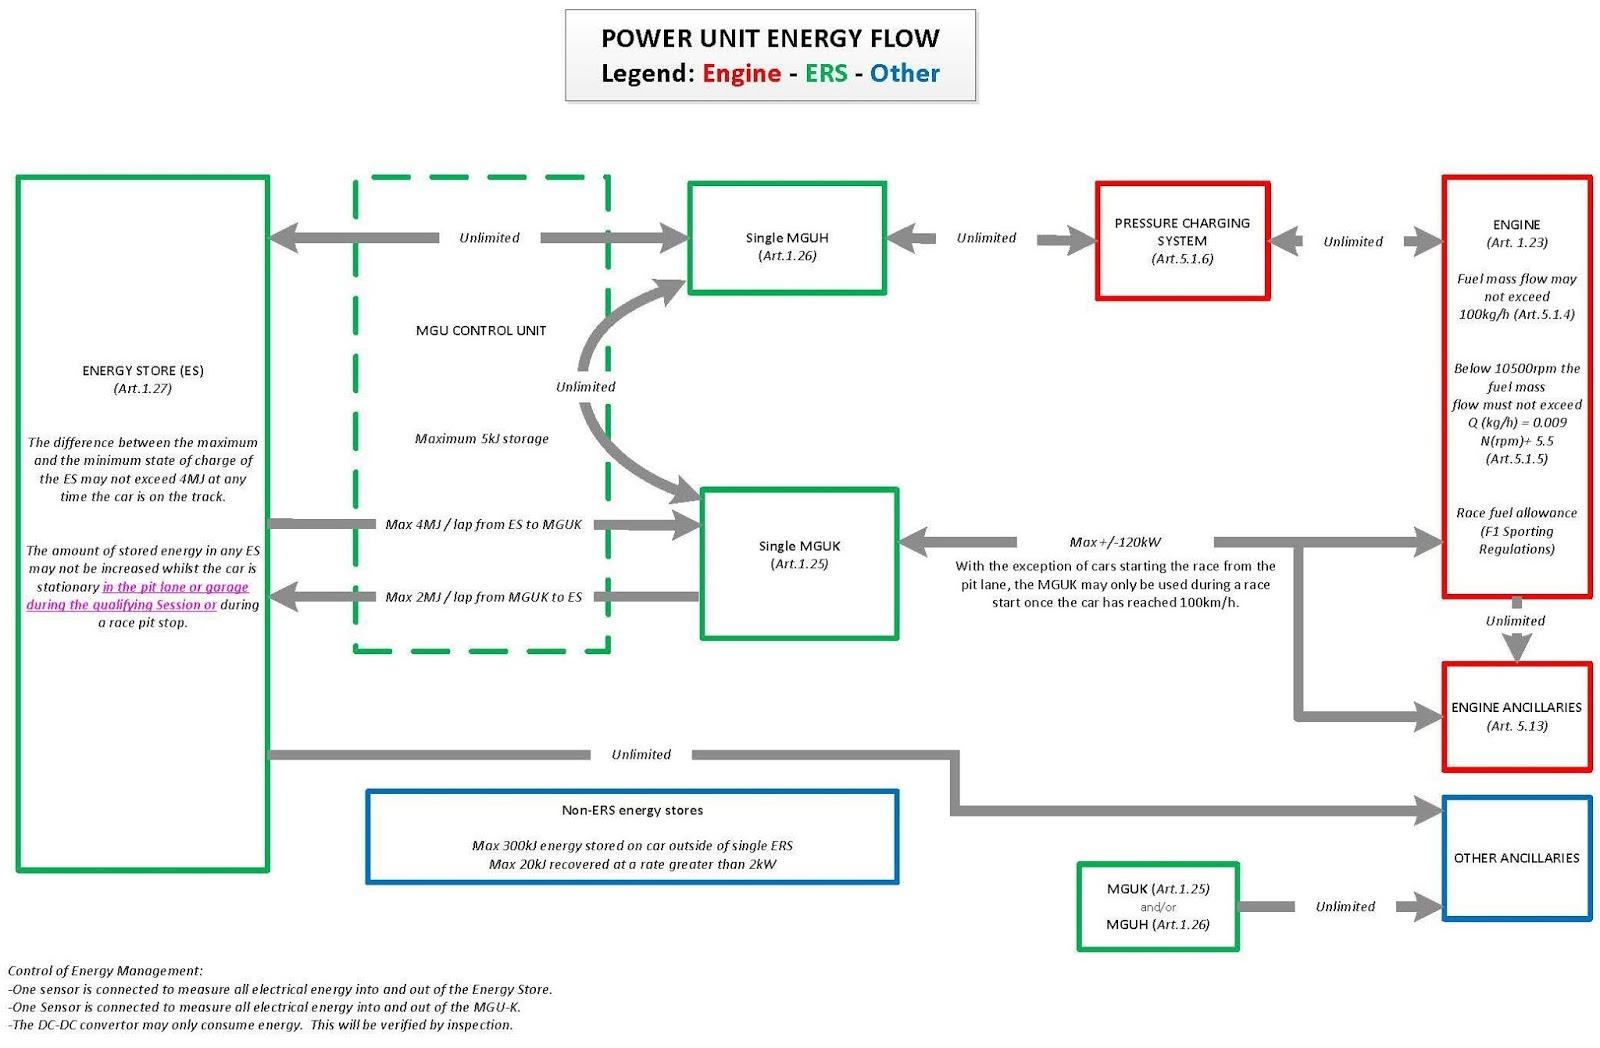 gi4_N8TzD2fhVc6c_E7B7BpMPRTPblU_A8ZW7rKEuw3TPWm249kXa dVtzgaHEUcrZ aSDskMHX50J4PACa4cjkRGbY5tbuL0zXP3y TSkVEICDQQj4Z3PWOj2jF0a3H0GZq7cNQ energy recovery system fundamentals and taking a look at ferrari's